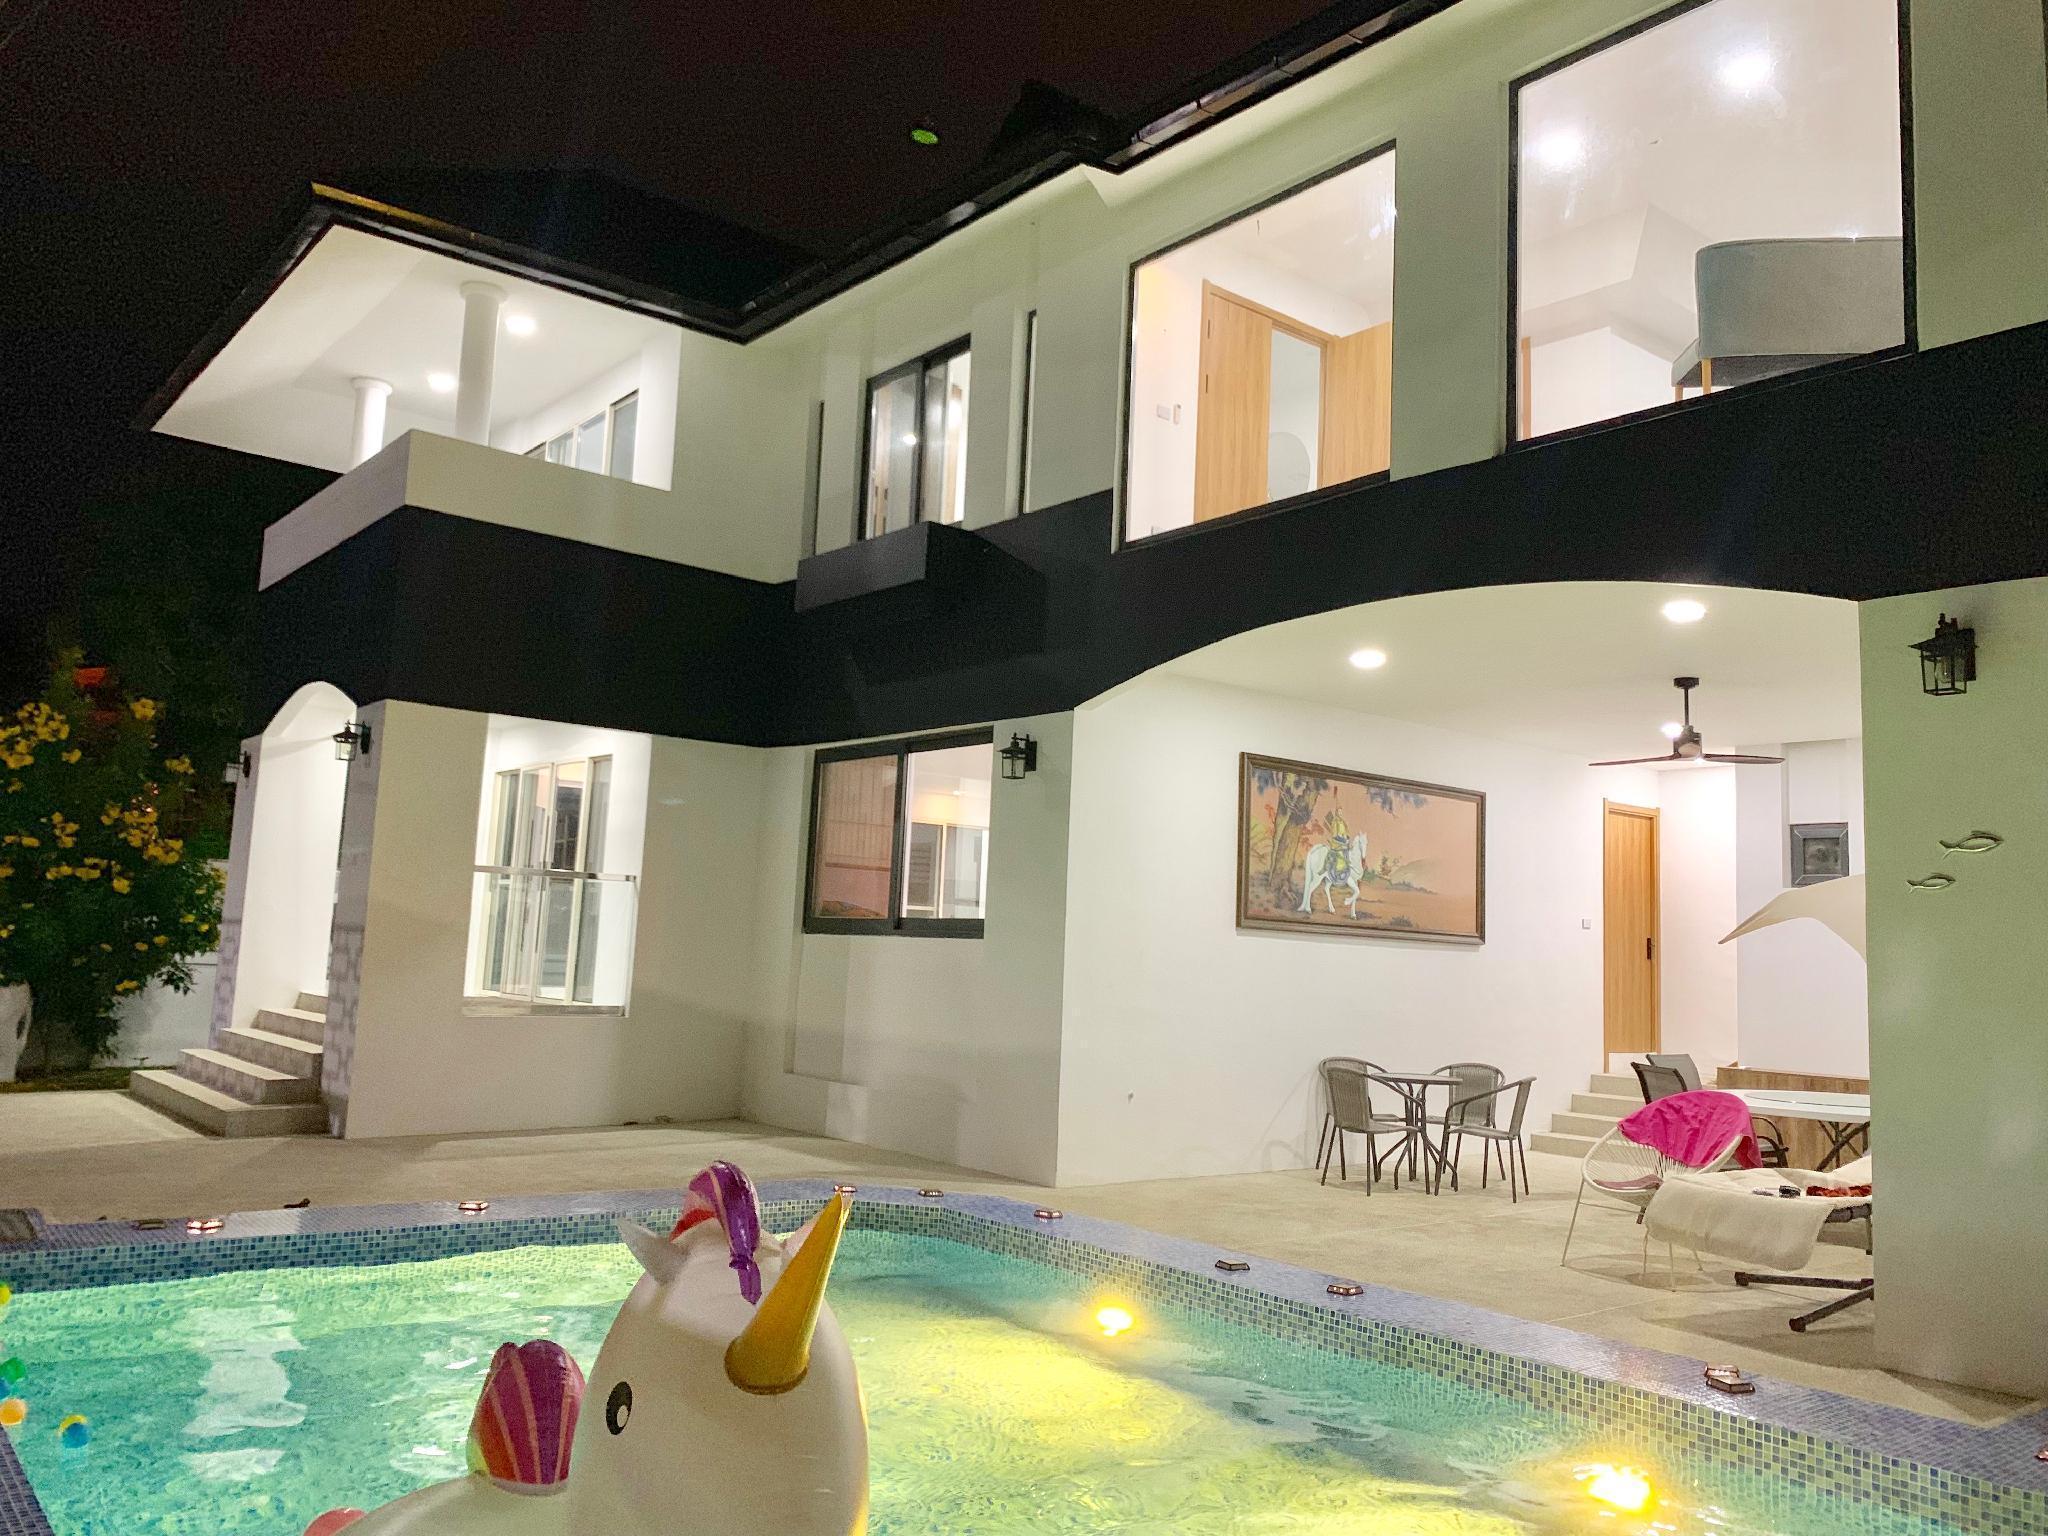 pattaya center 4bedroom วิลลา 4 ห้องนอน 4 ห้องน้ำส่วนตัว ขนาด 600 ตร.ม. – พัทยากลาง